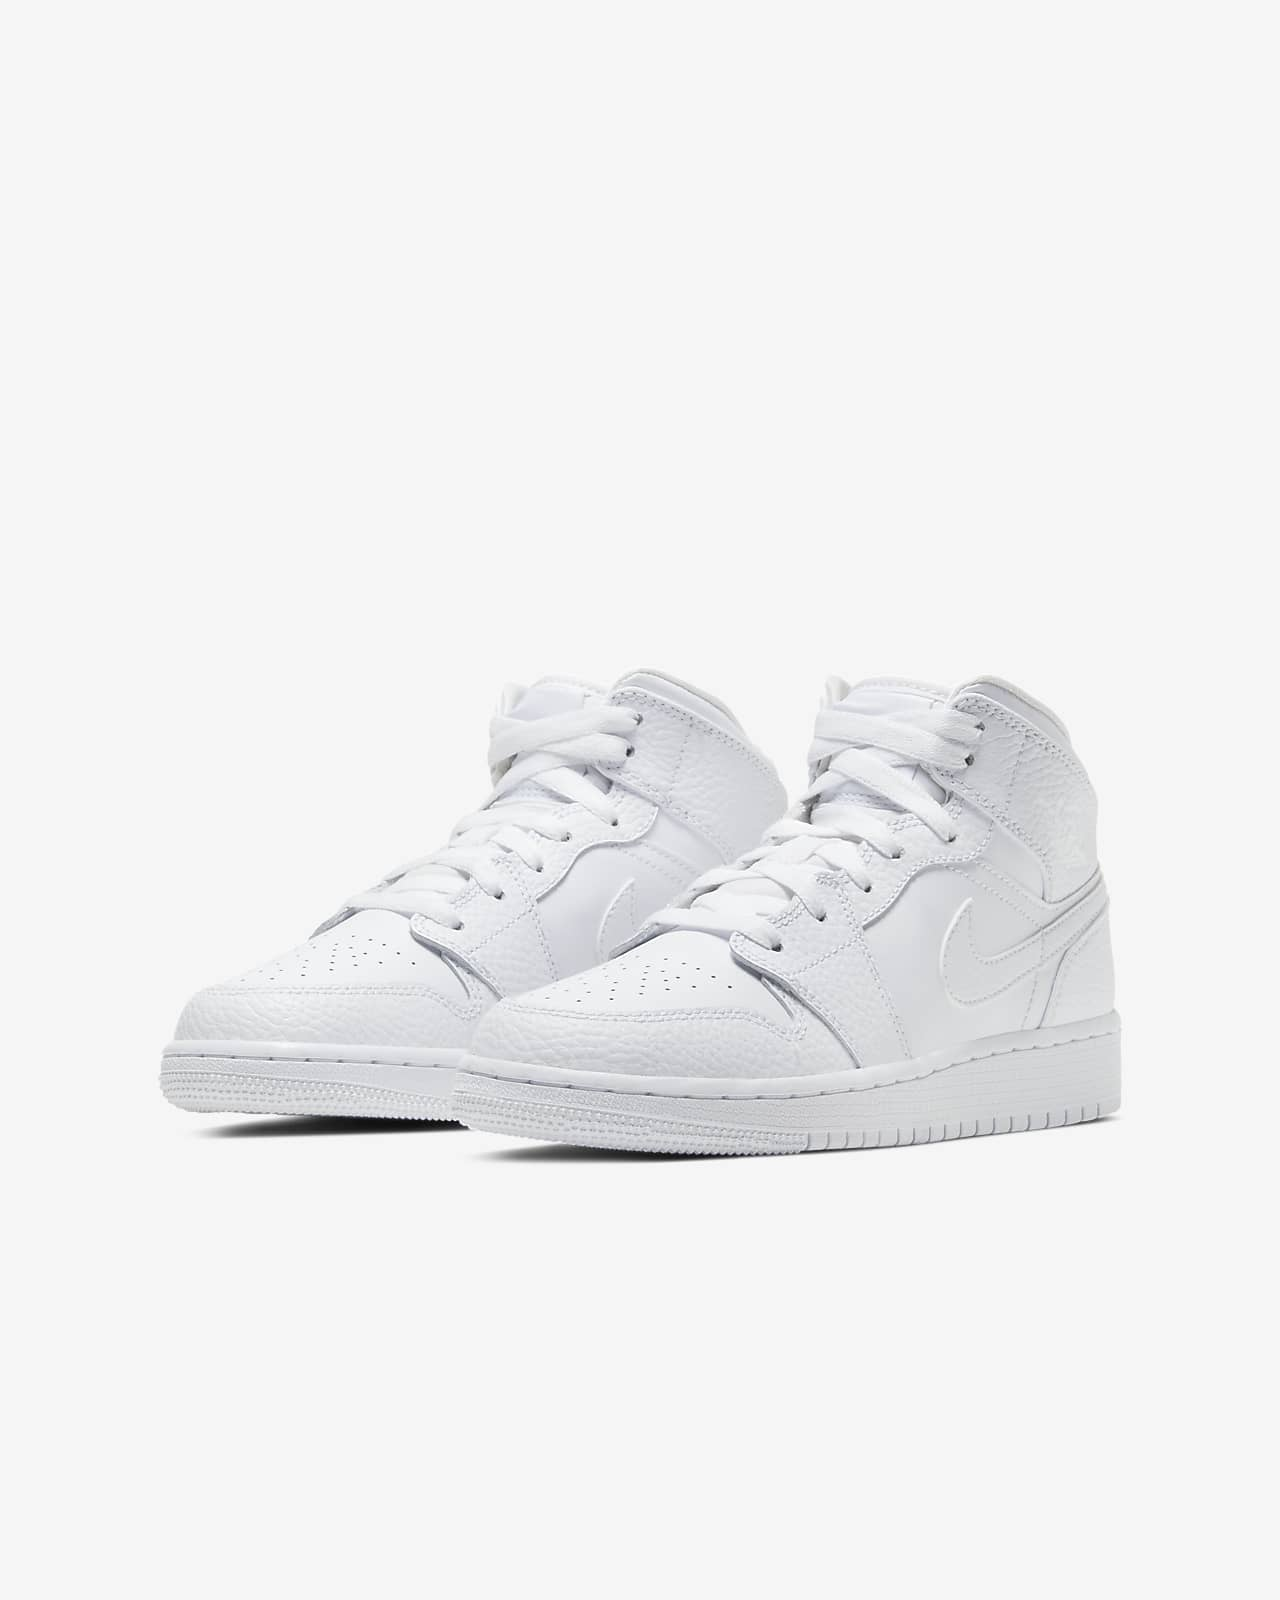 Air Jordan 1 Mid Older Kids' Shoes. Nike ZA